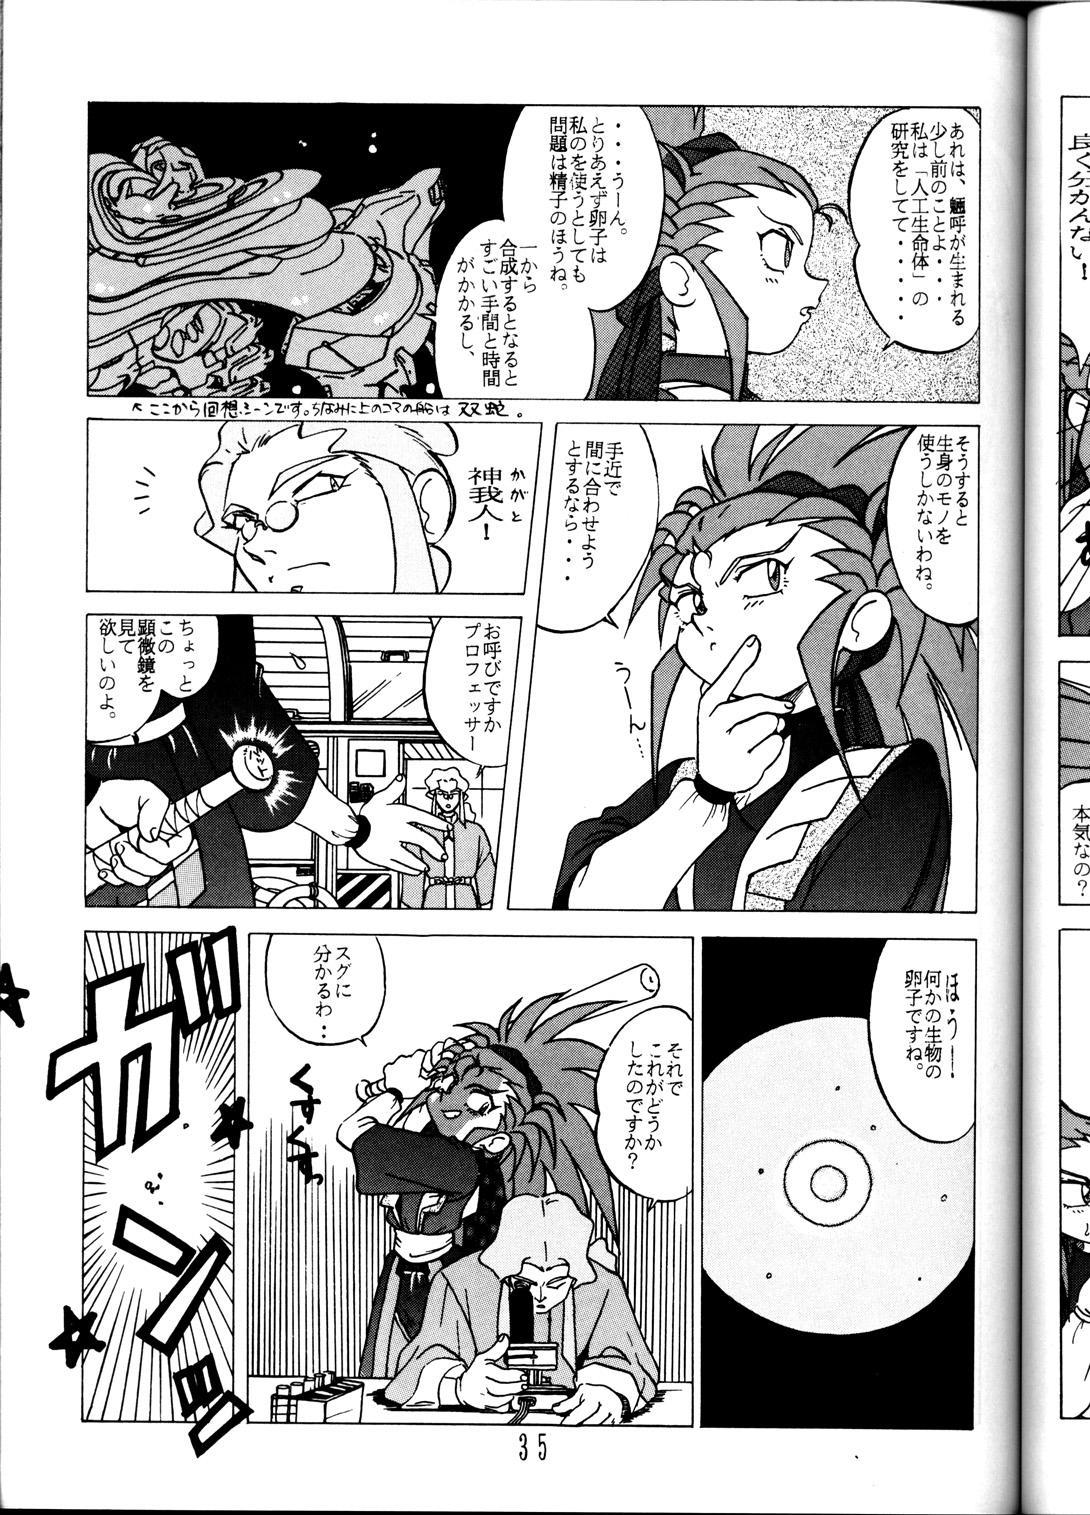 Tenchi Muyou! Sample Vol 6 33